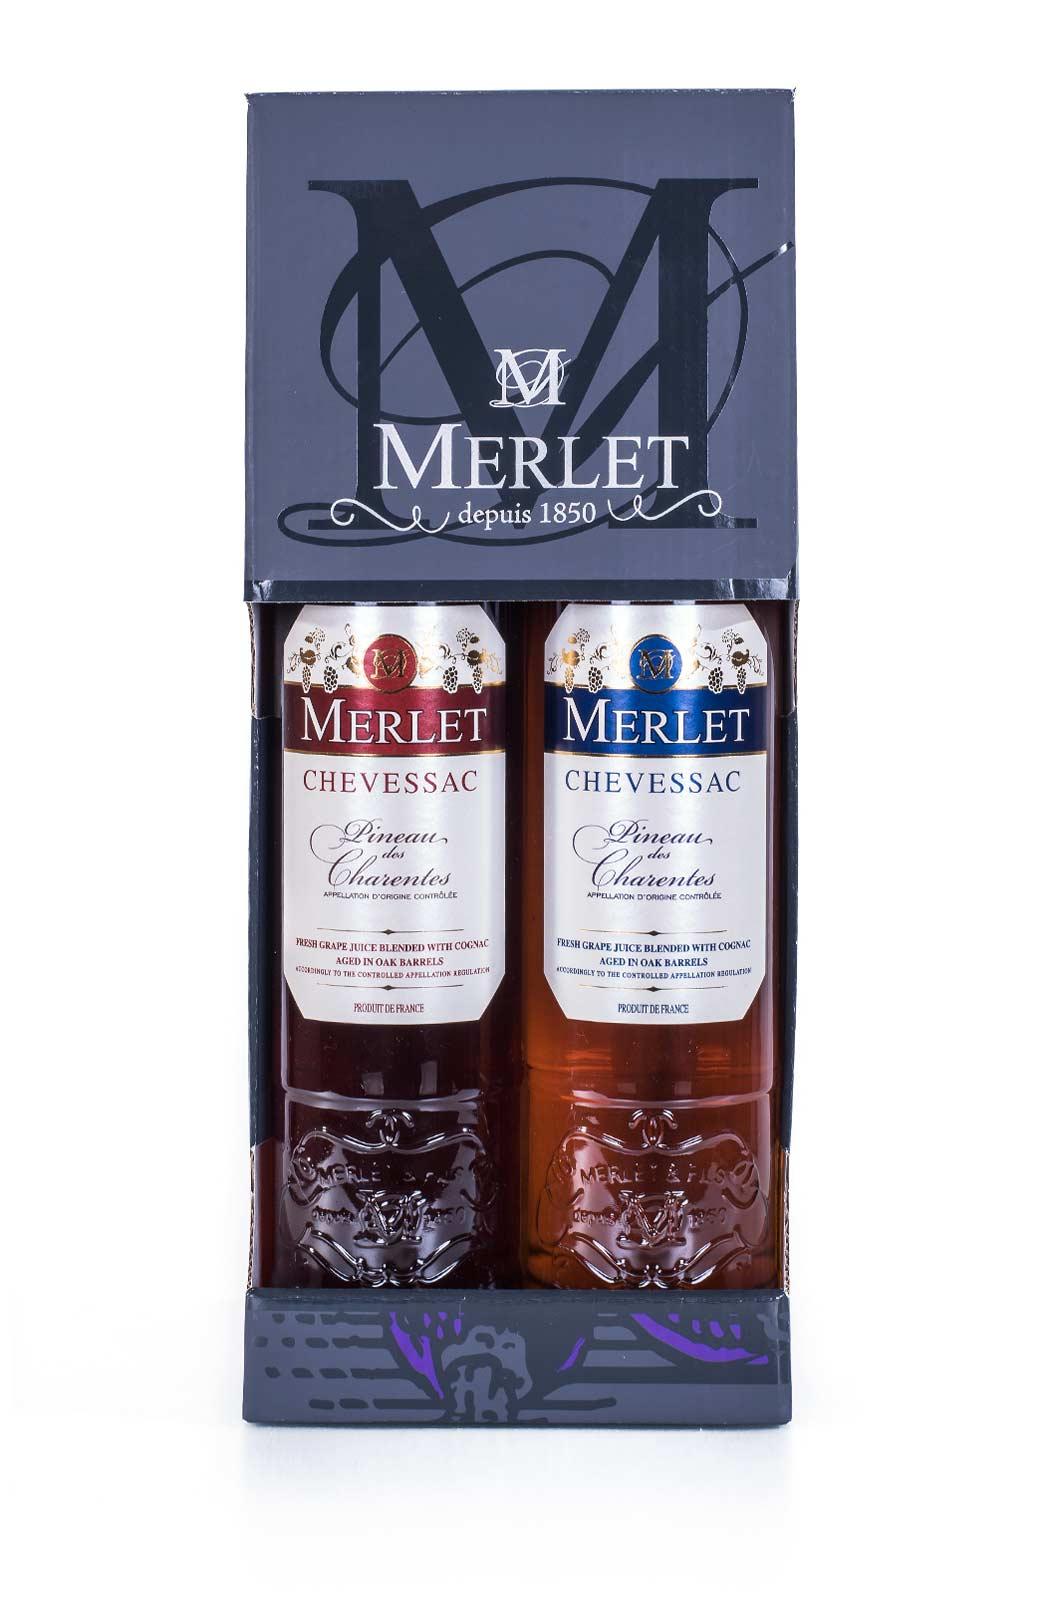 45-merlet-pineau-chevessac-blanc-rose-coffret